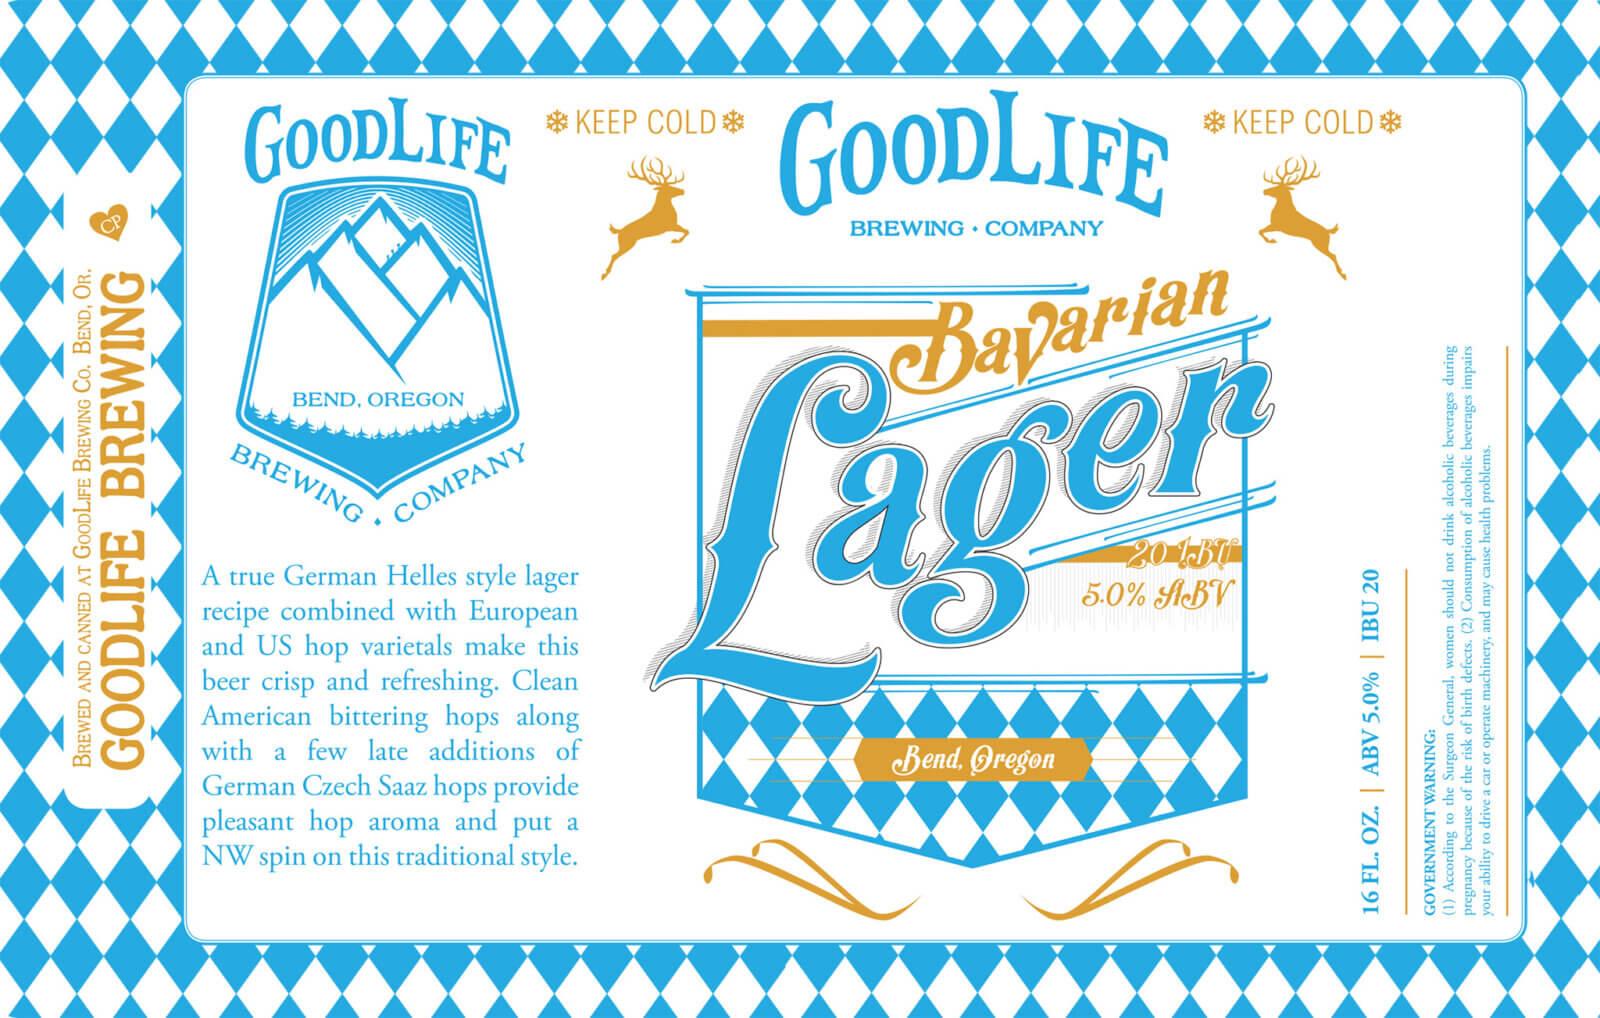 Bavarian lager design by Crowerks